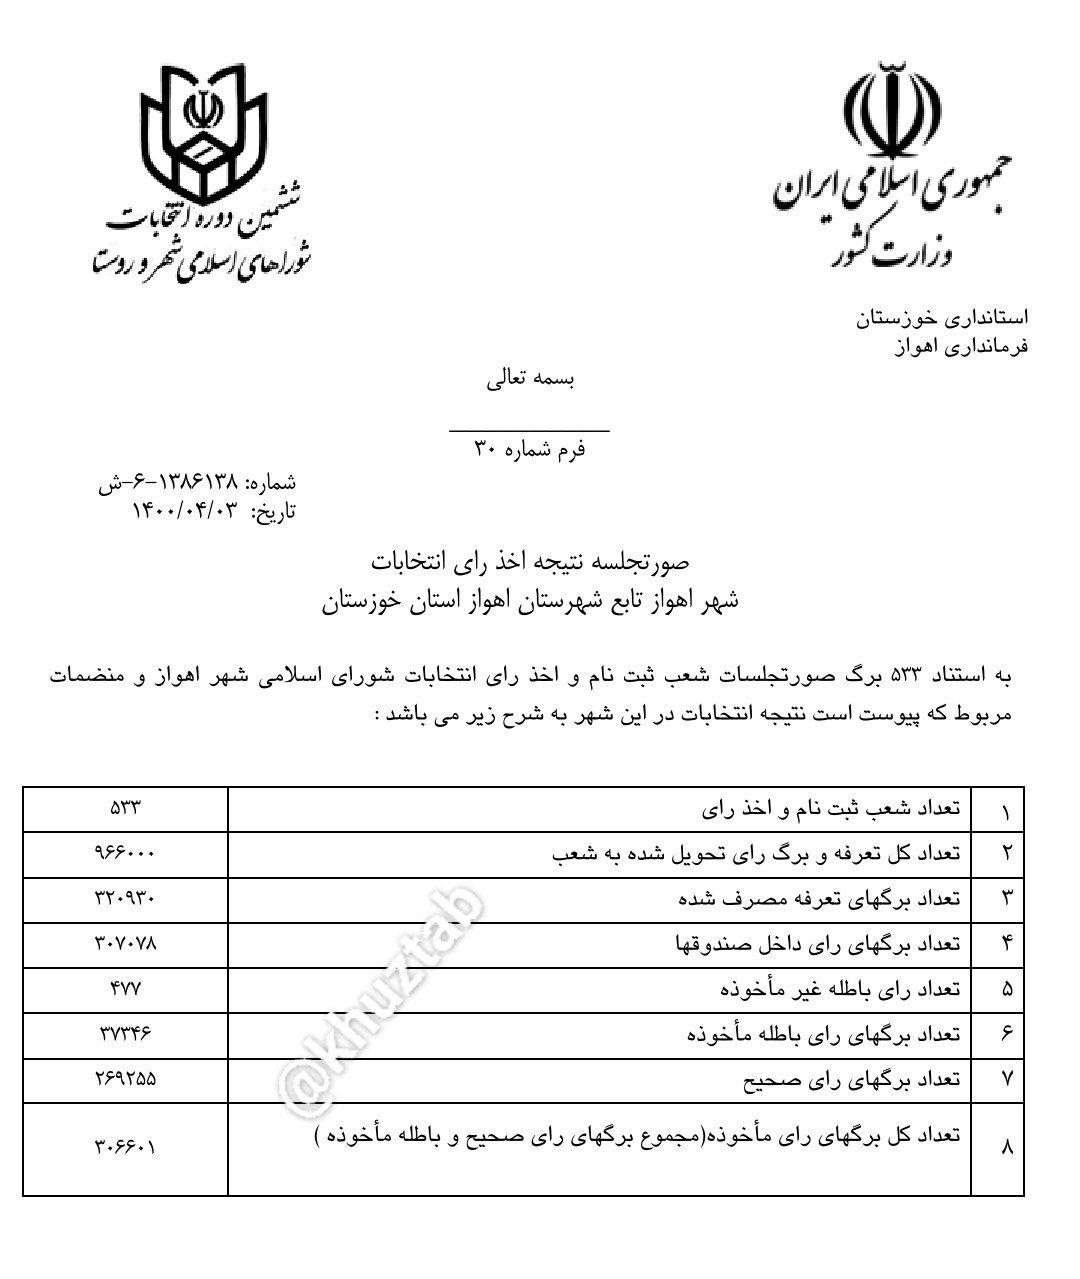 IMG 20210624 115545 174 نتیجه انتخابات شورای شهر اهواز اعلام شد